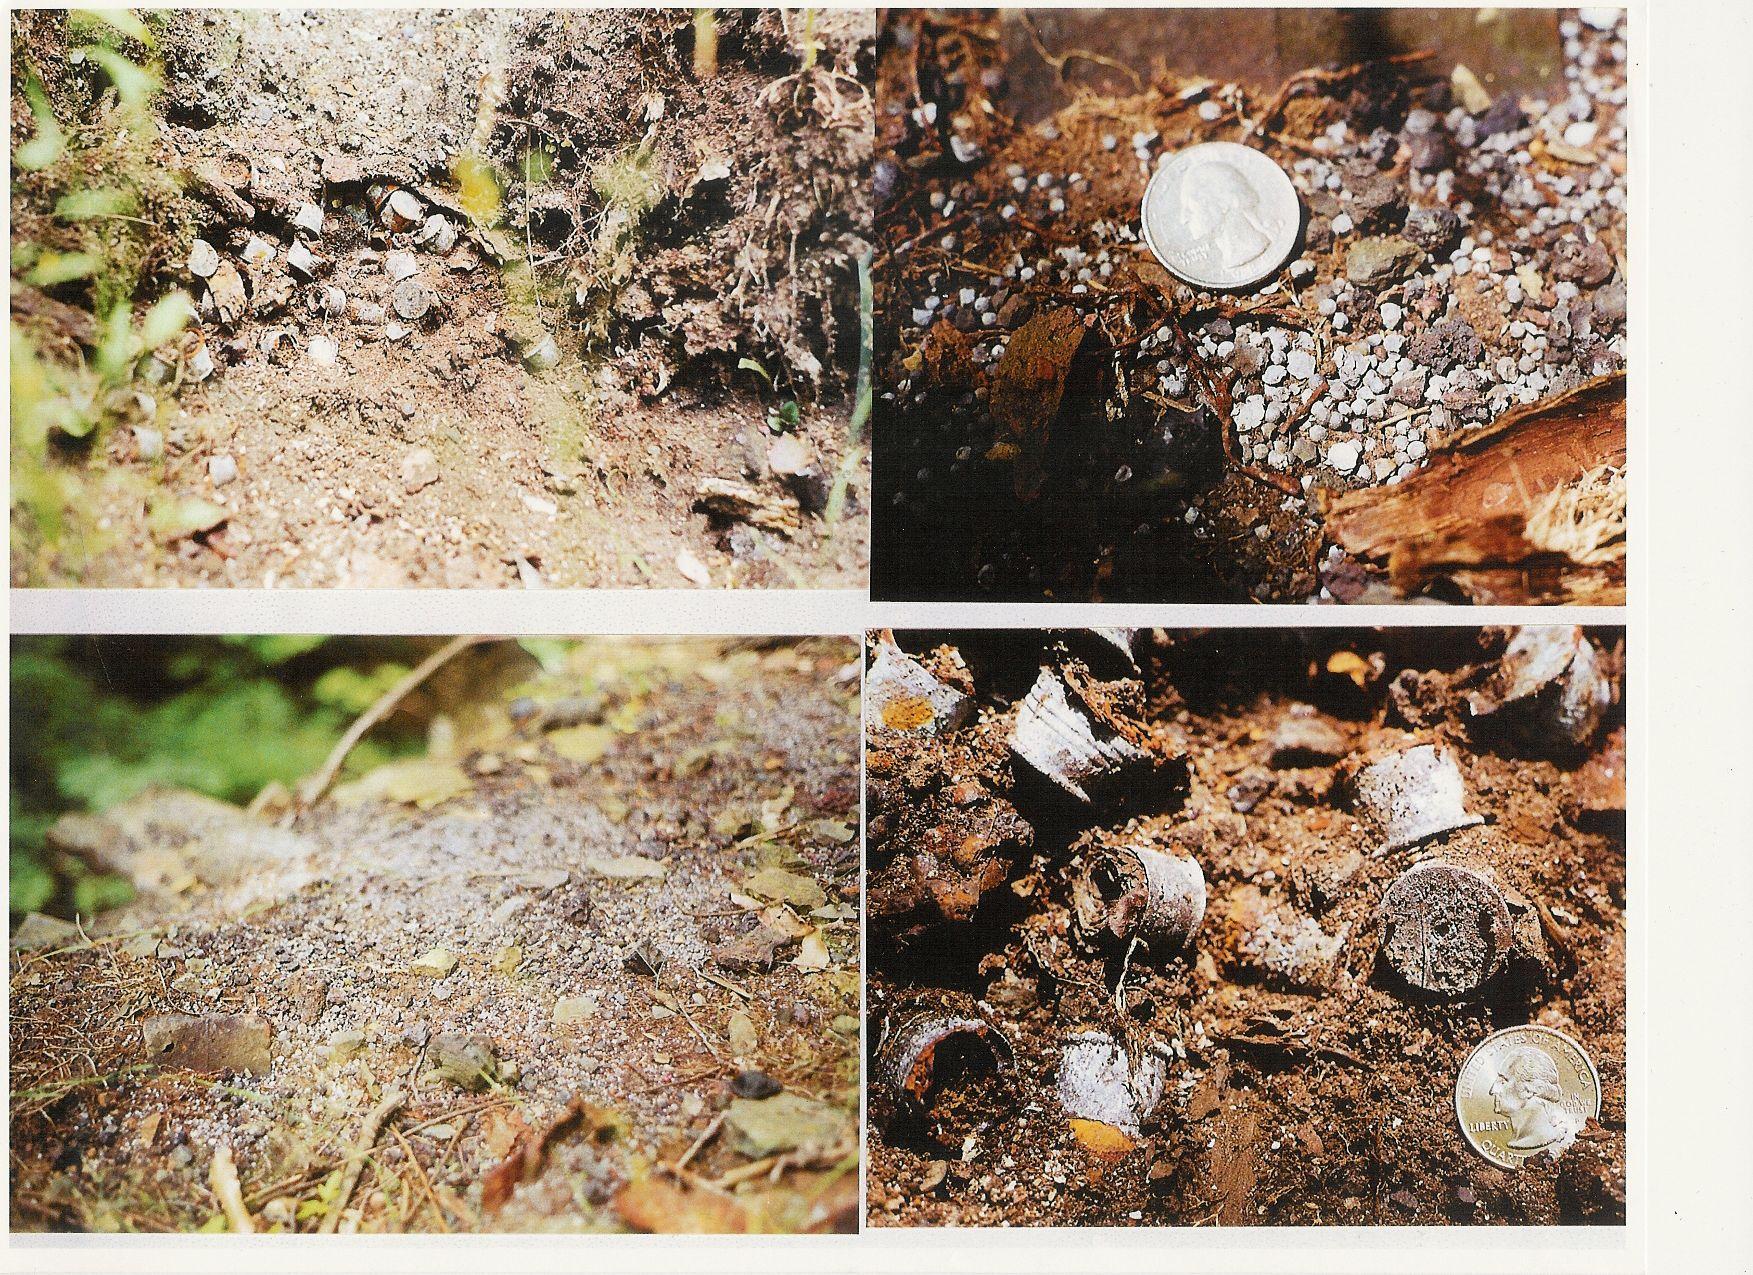 Lead Pollution and Shotgun Shell Pollution at Ithaca Falls -- Walter Hang